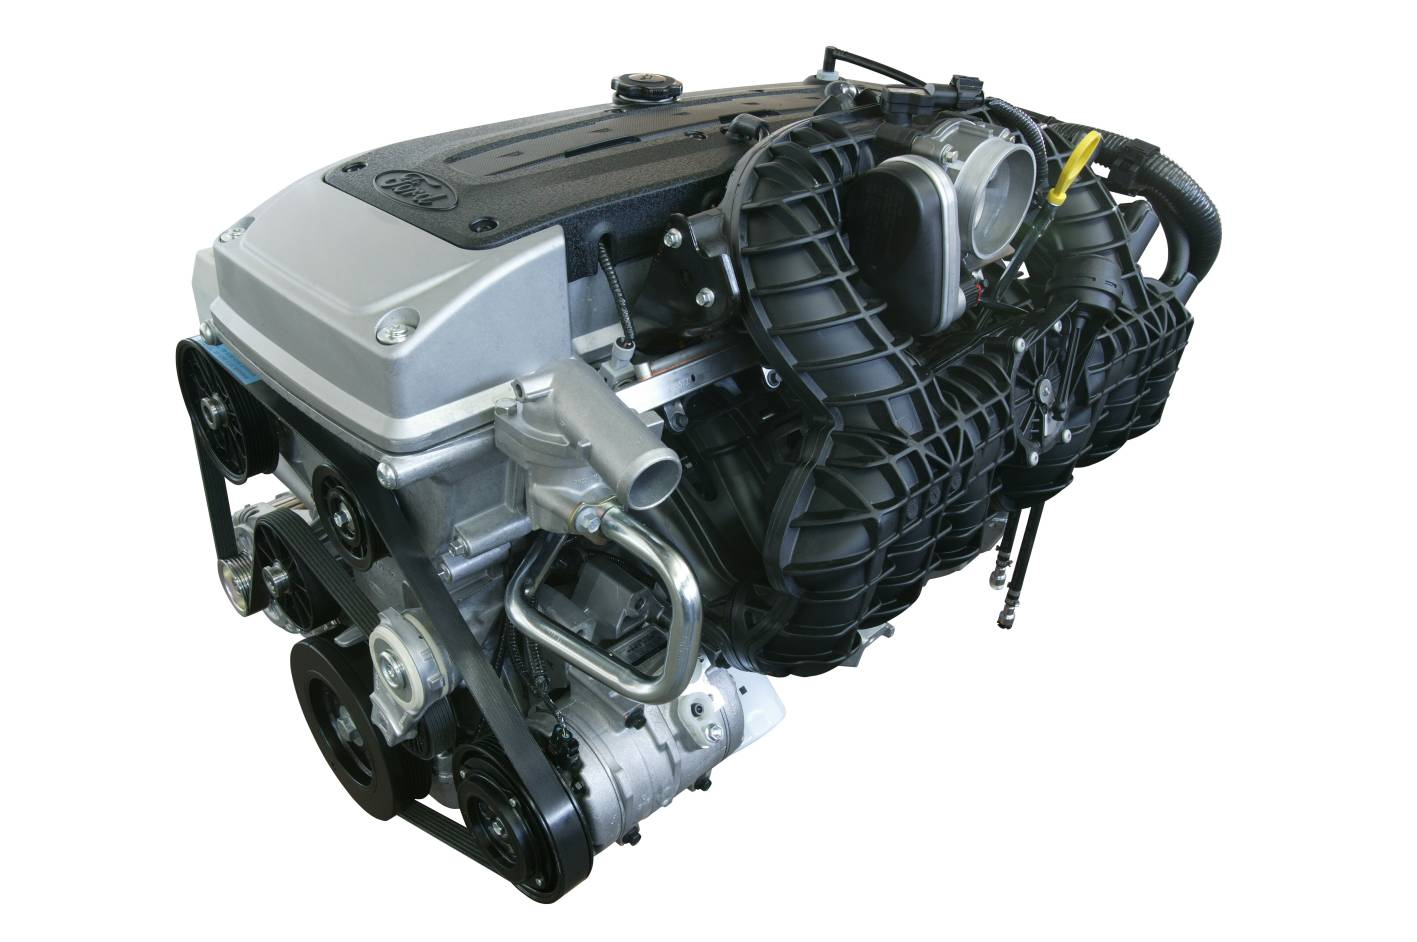 2009_ford_territory_06_petrol_inline_6_i6_engine_01